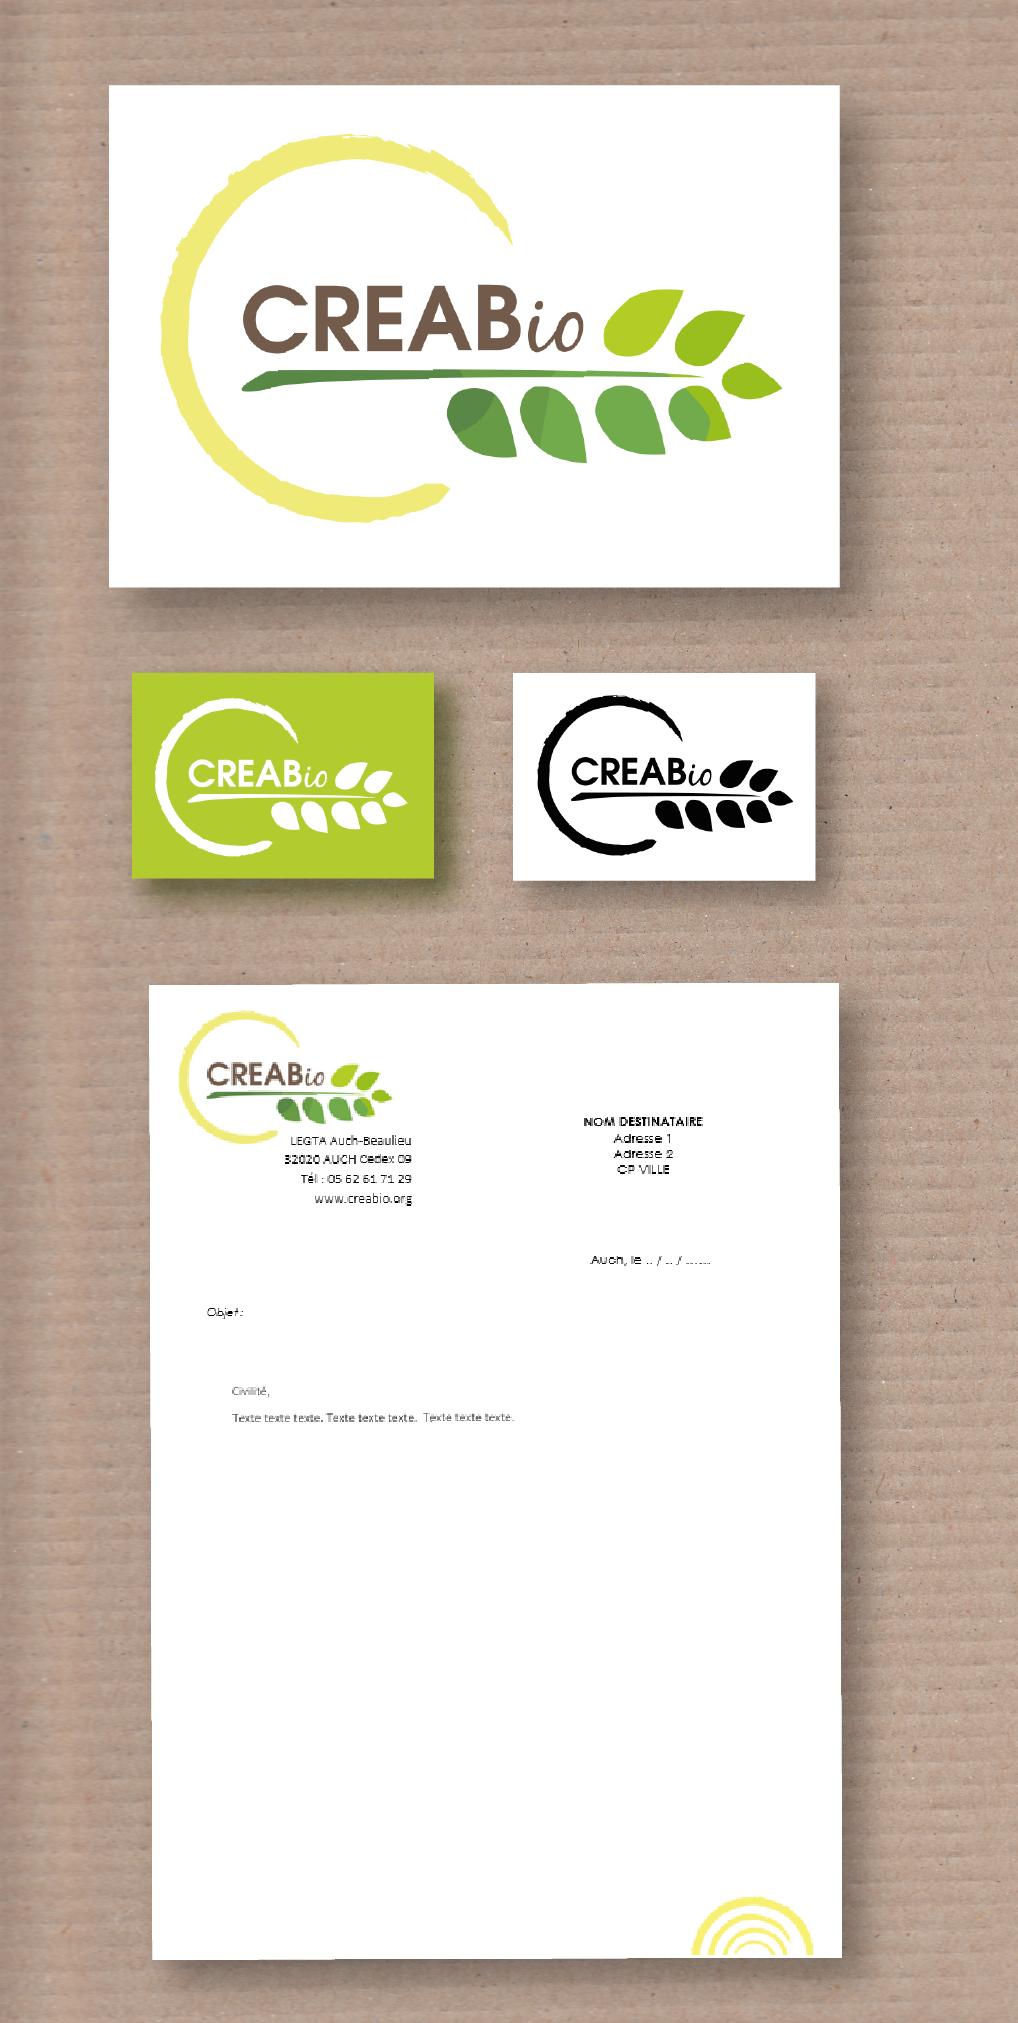 Association CREABio Gers